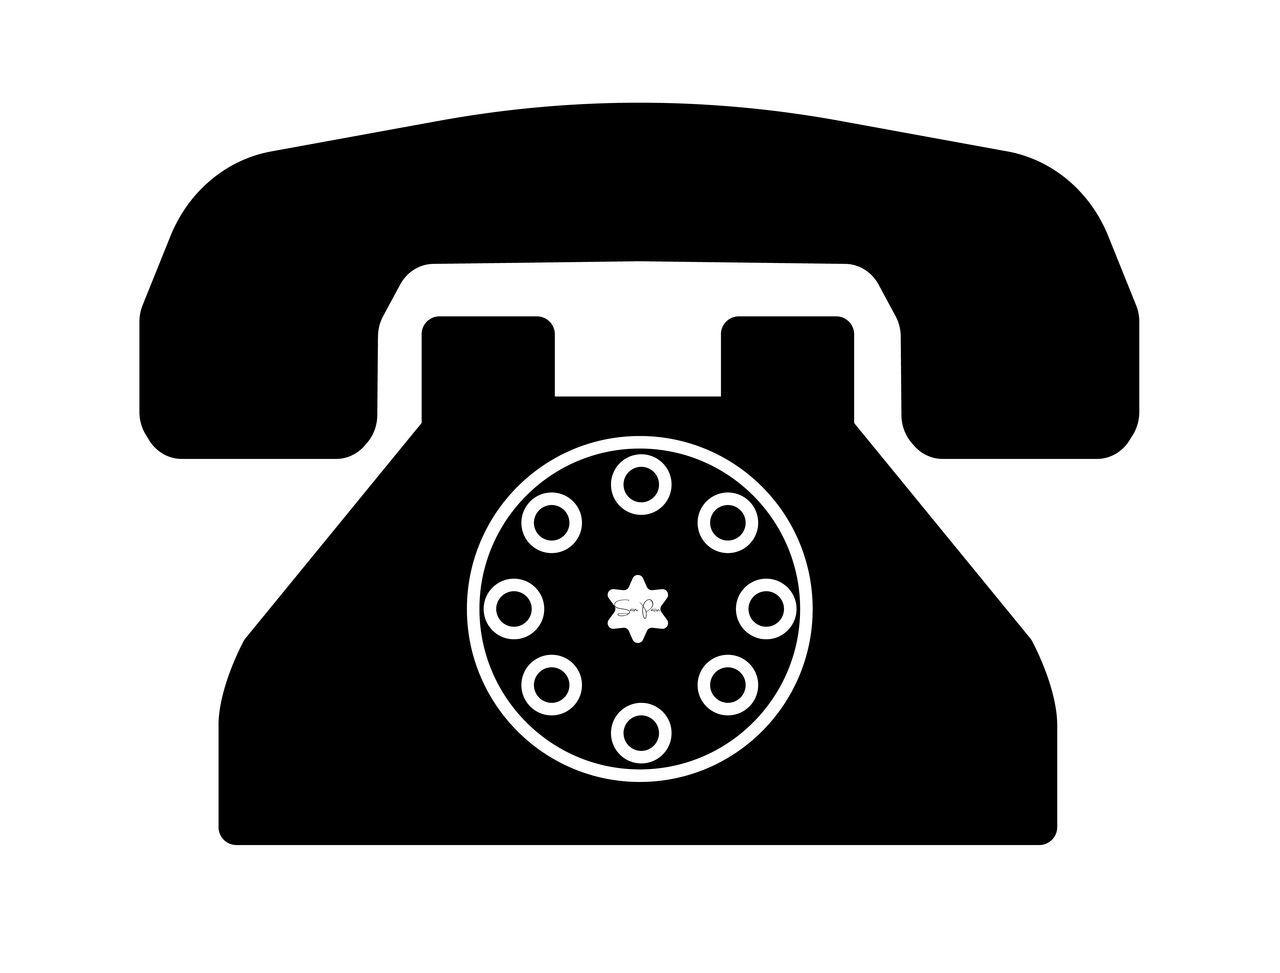 telefono phone 6